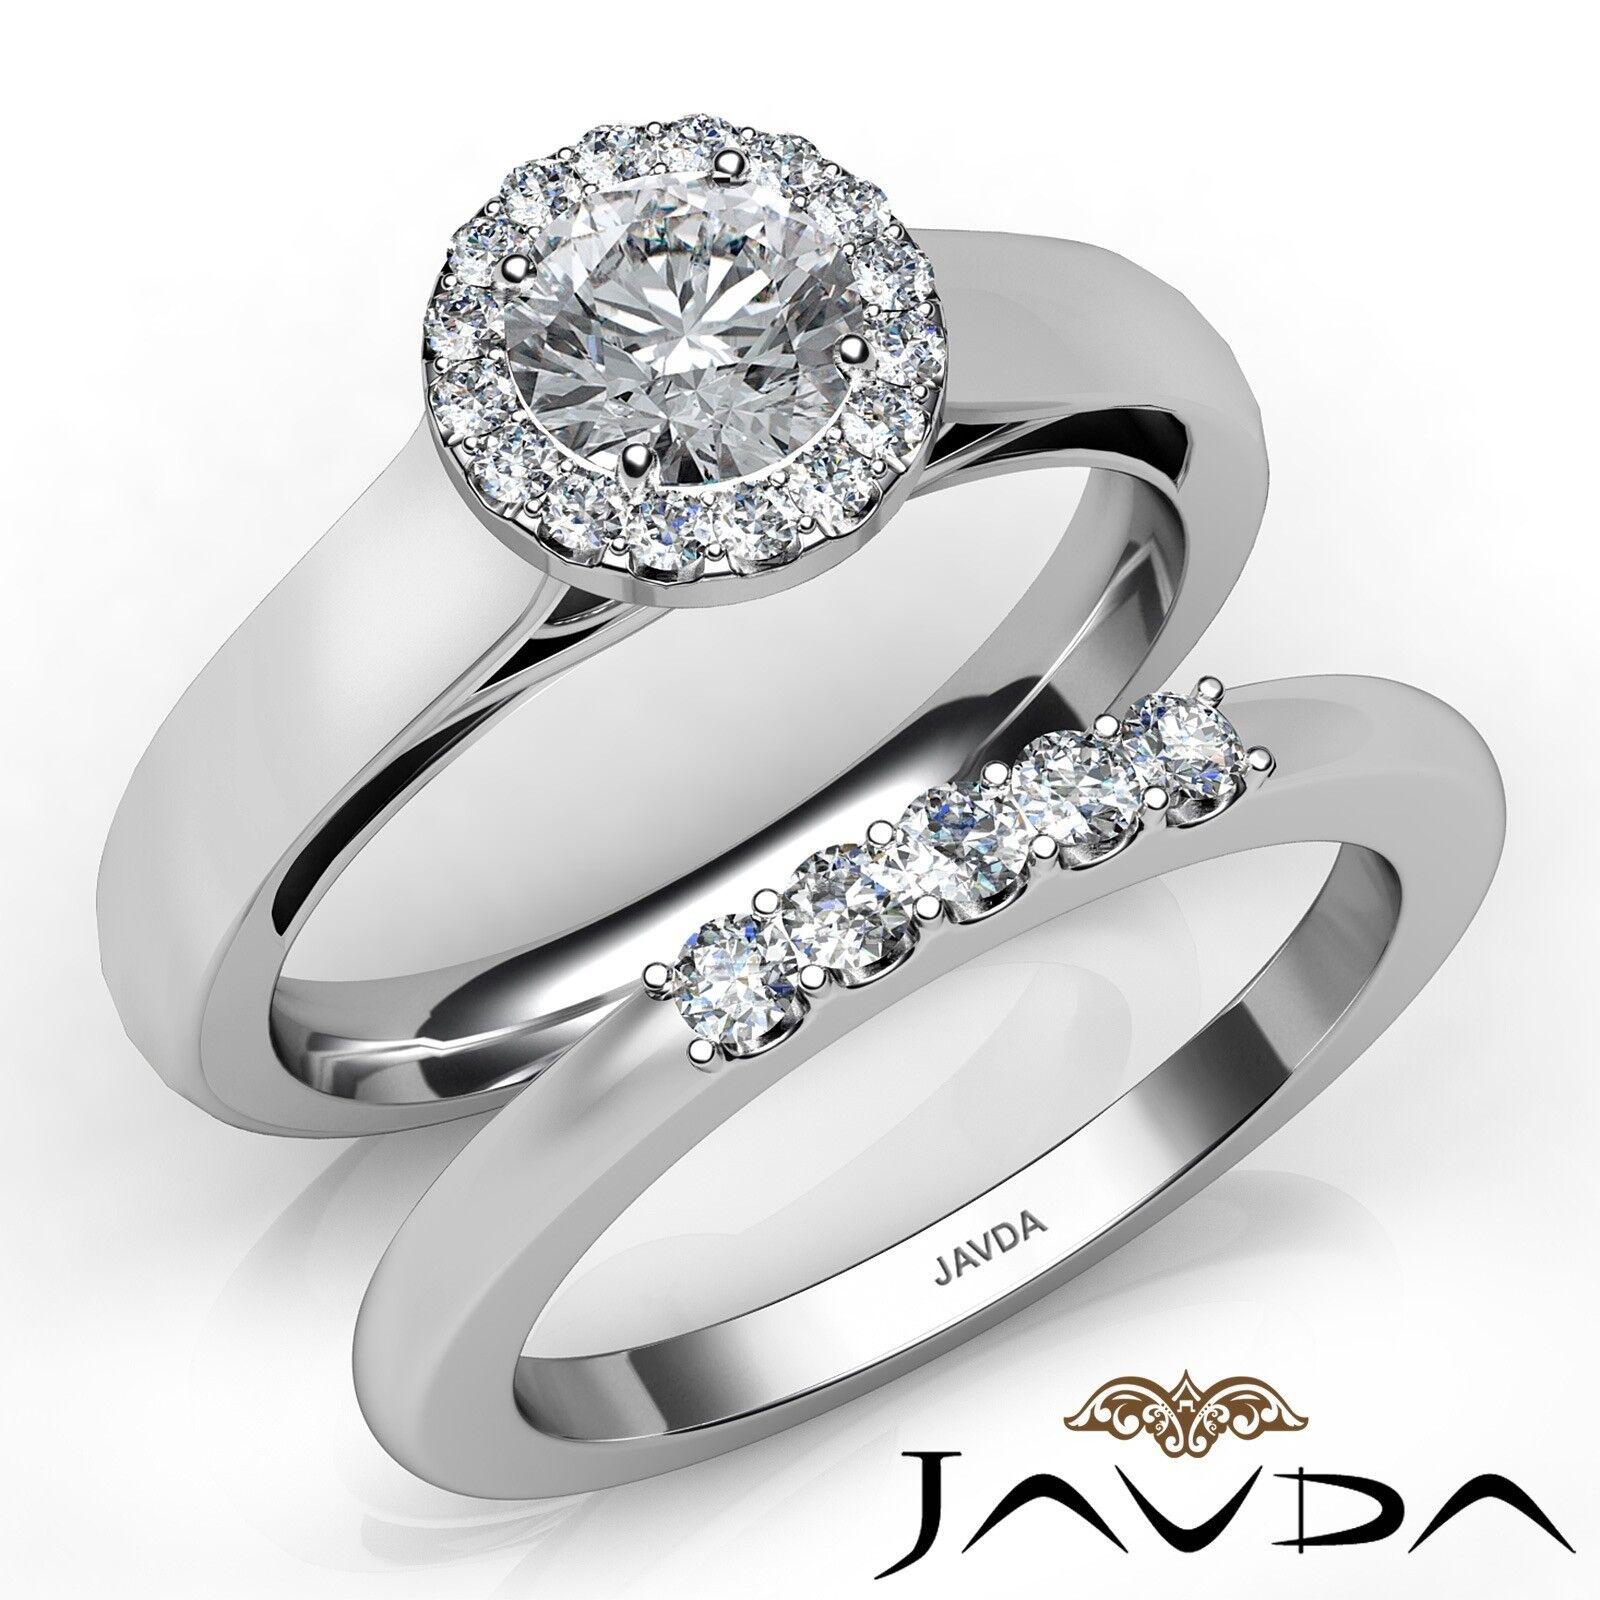 1ctw U Prong Halo Bridal Round Diamond Engagement Her Ring GIA F-VVS1 White Gold